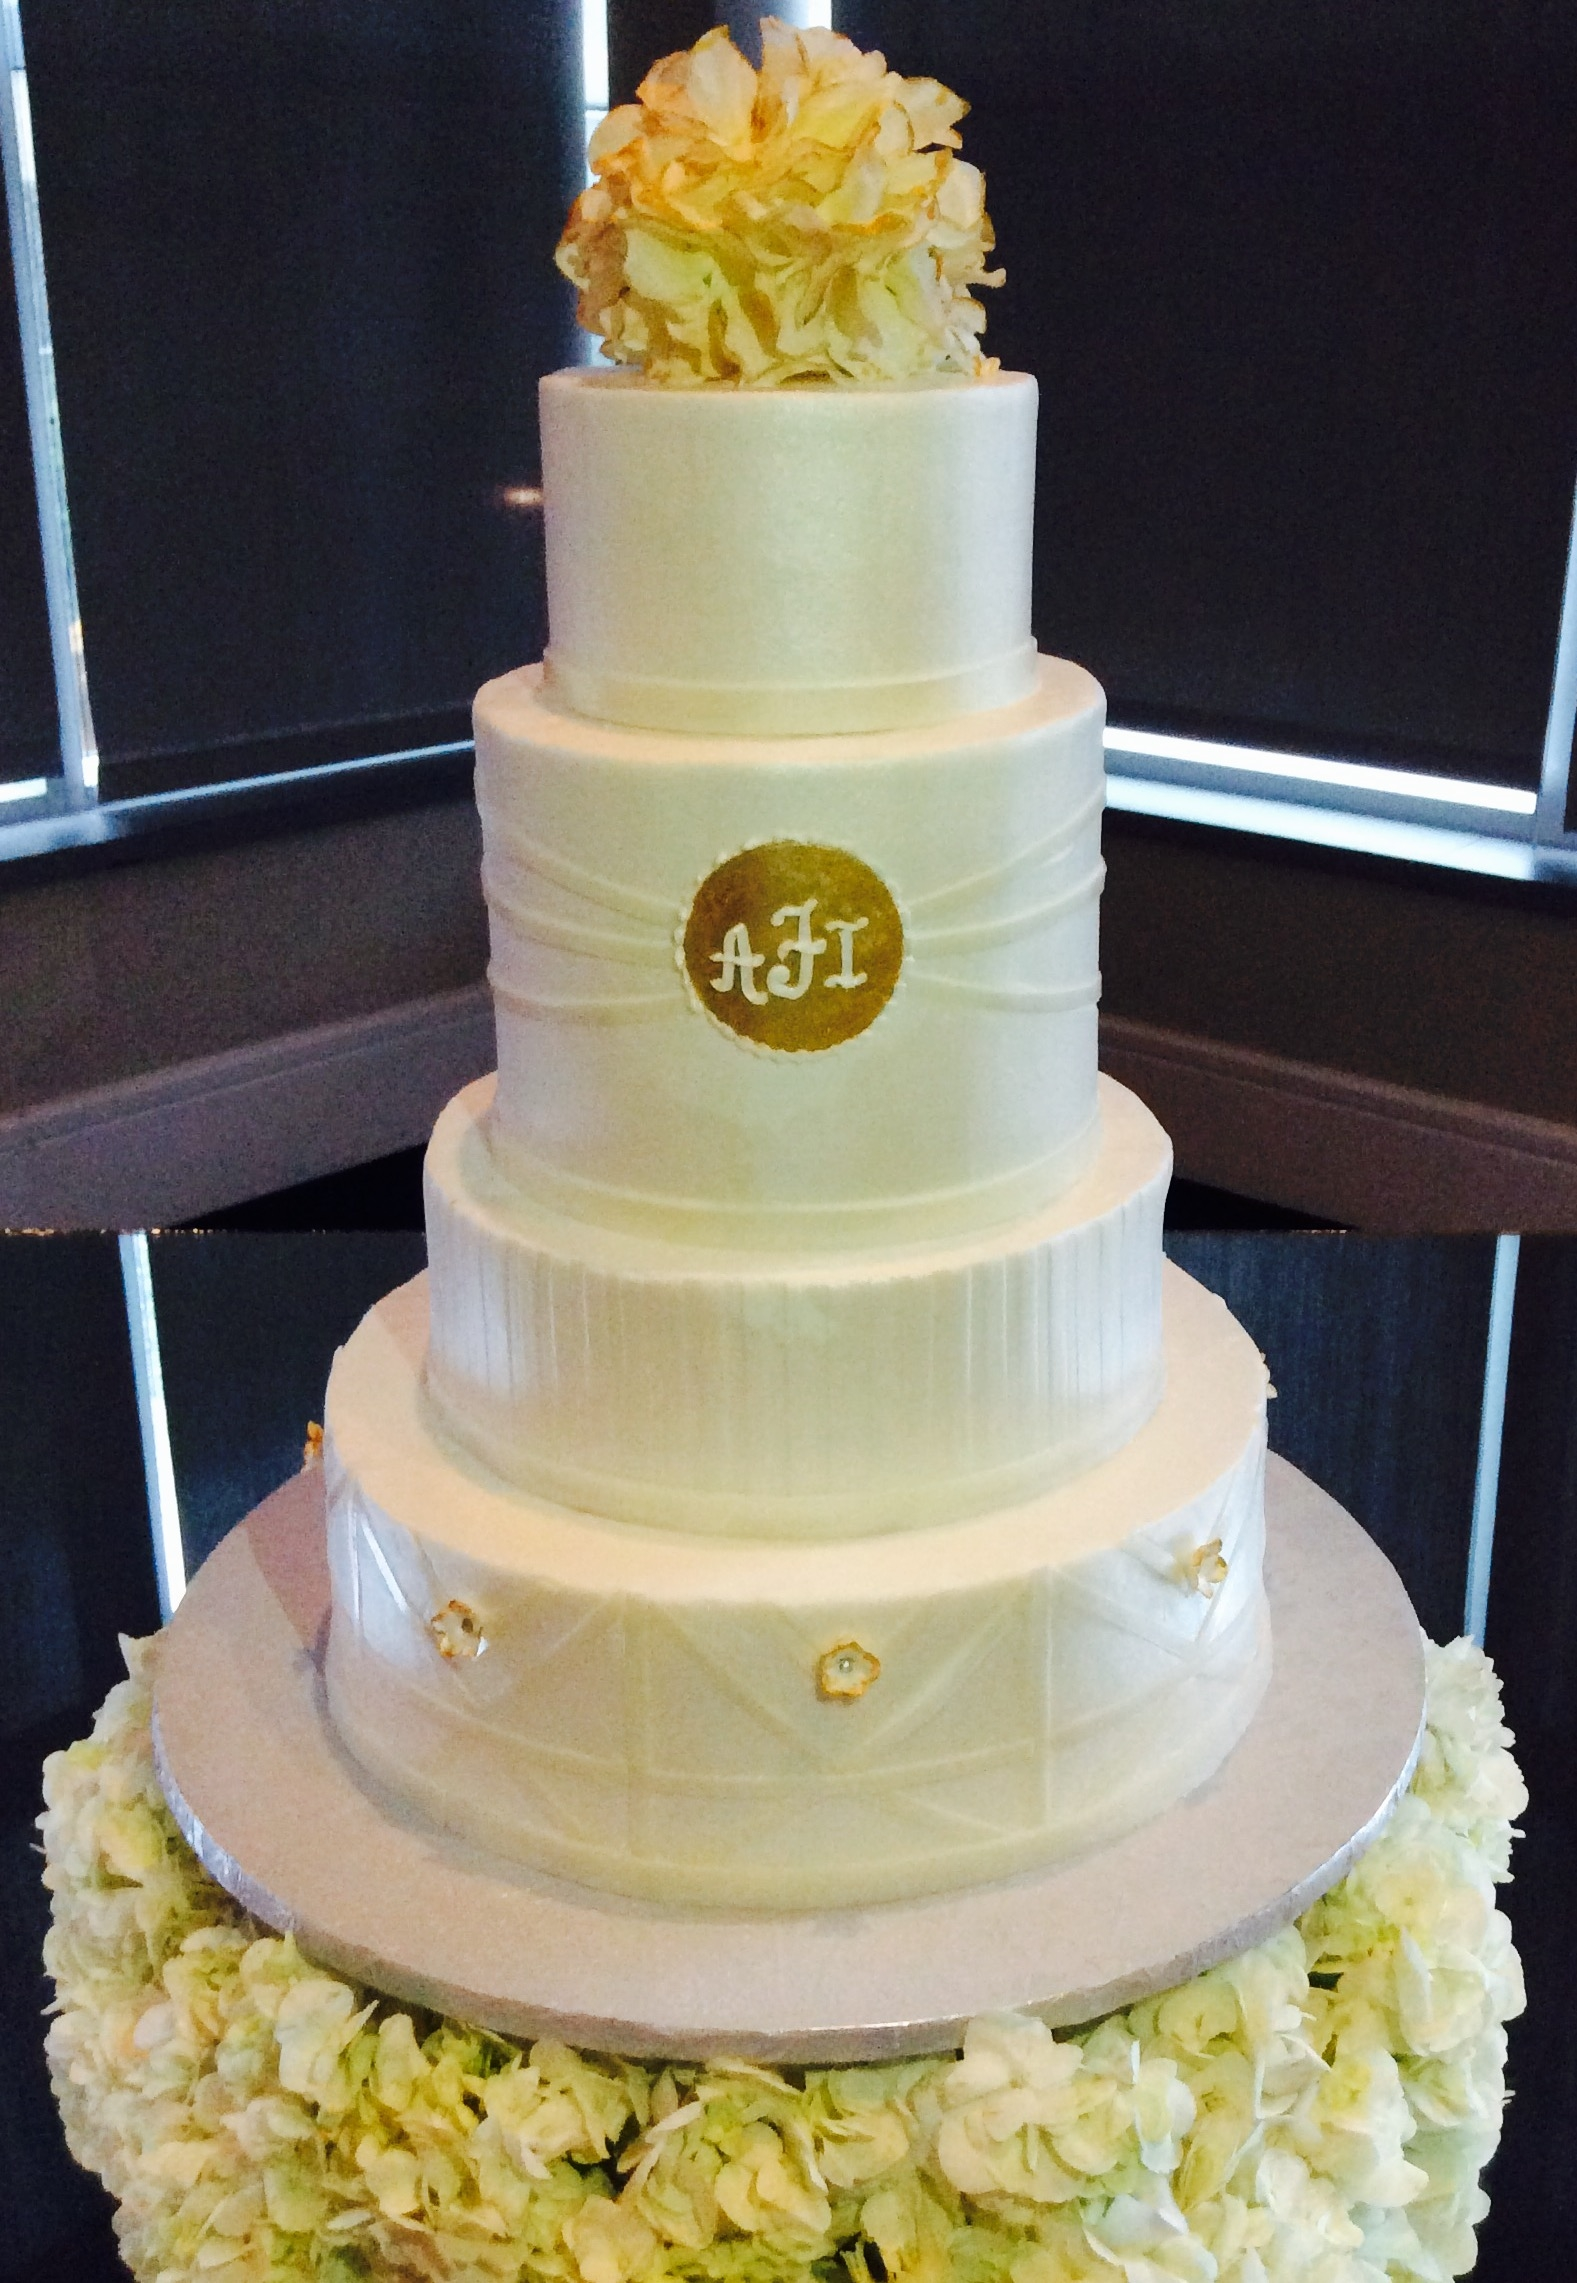 Wedding Cakes by Tammy Allen image 5